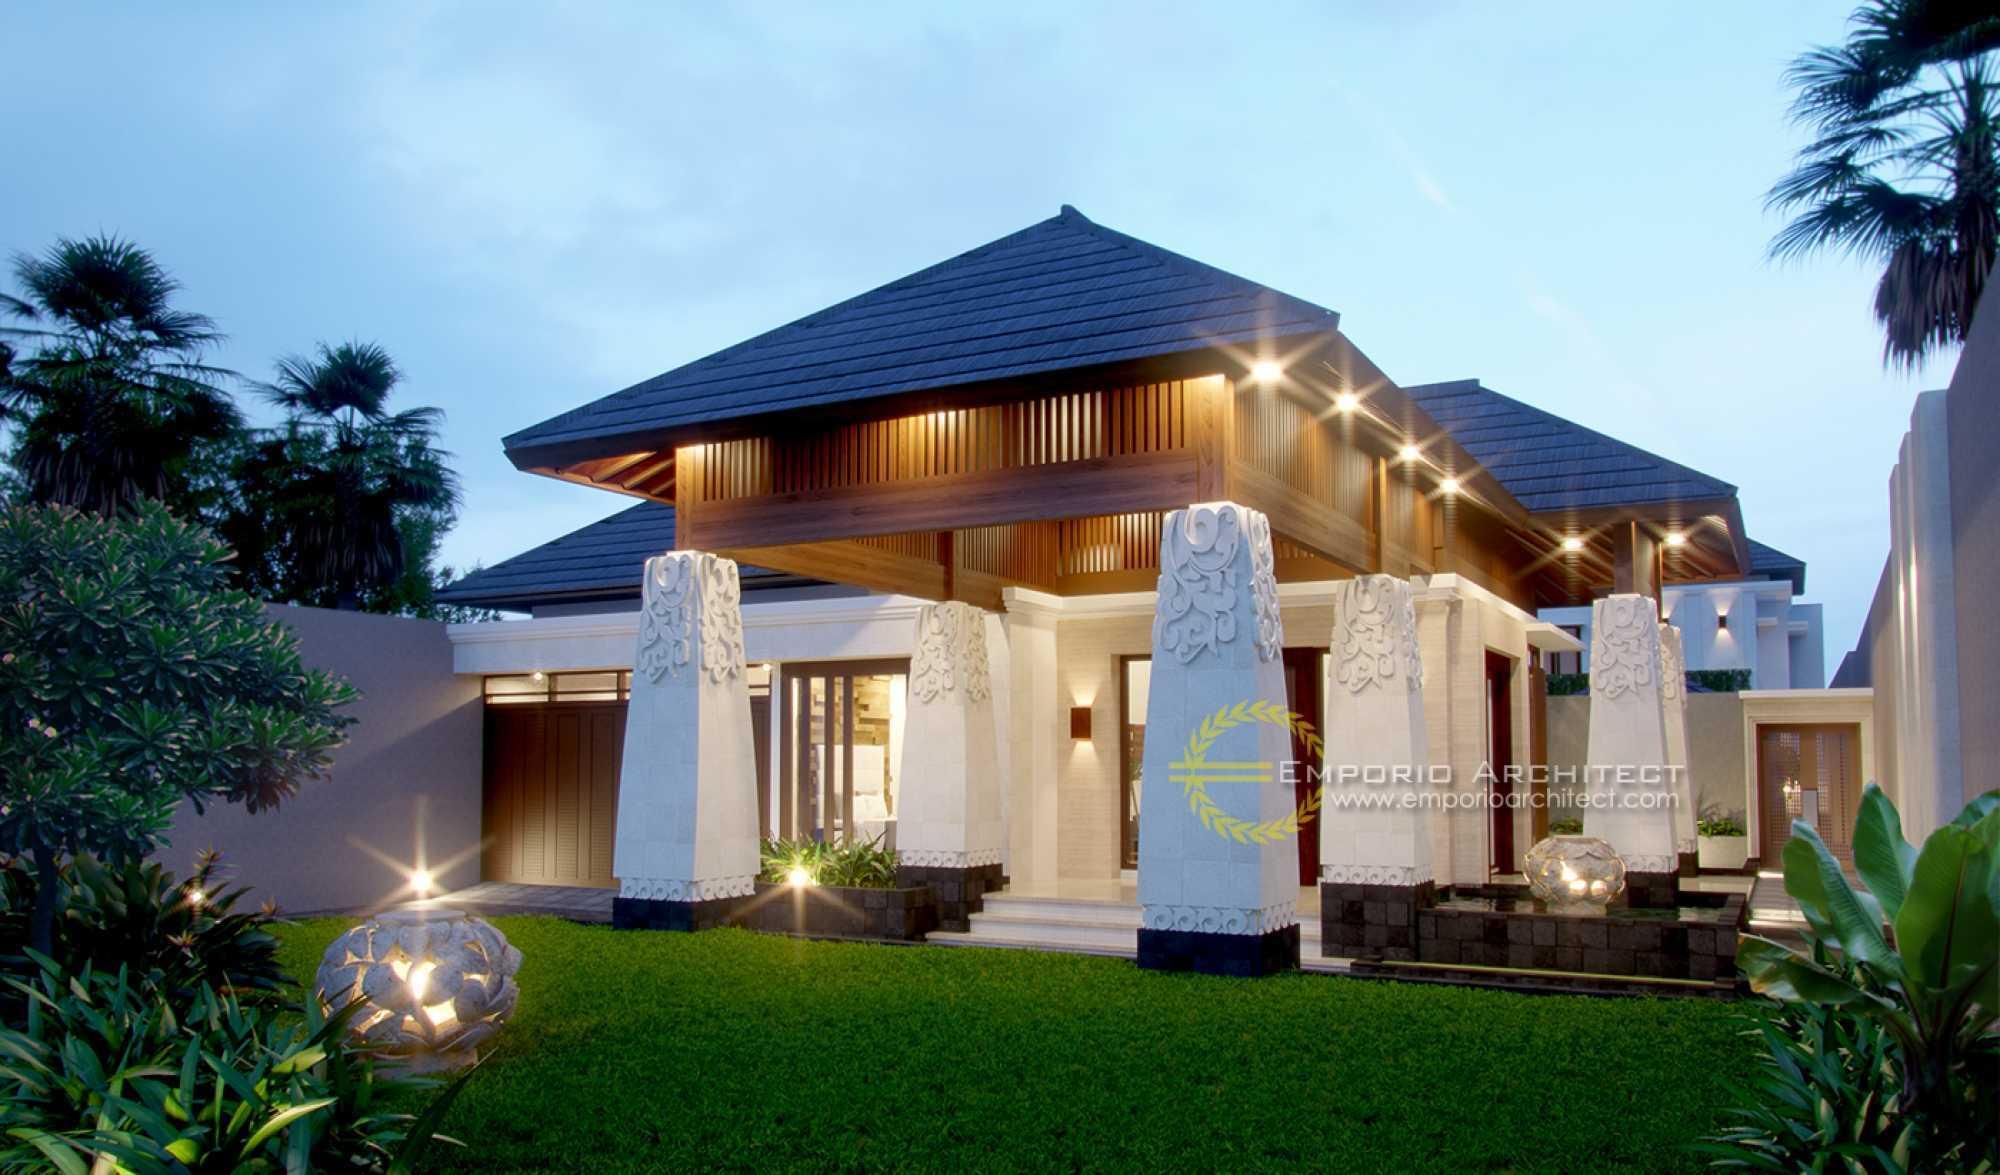 Emporio Architect Desain Rumah Villa Bali Tropis 239 @ Jakarta Jakarta, Daerah Khusus Ibukota Jakarta, Indonesia Jakarta, Daerah Khusus Ibukota Jakarta, Indonesia Emporio-Architect-Desain-Rumah-654-M2 Tropical  73115